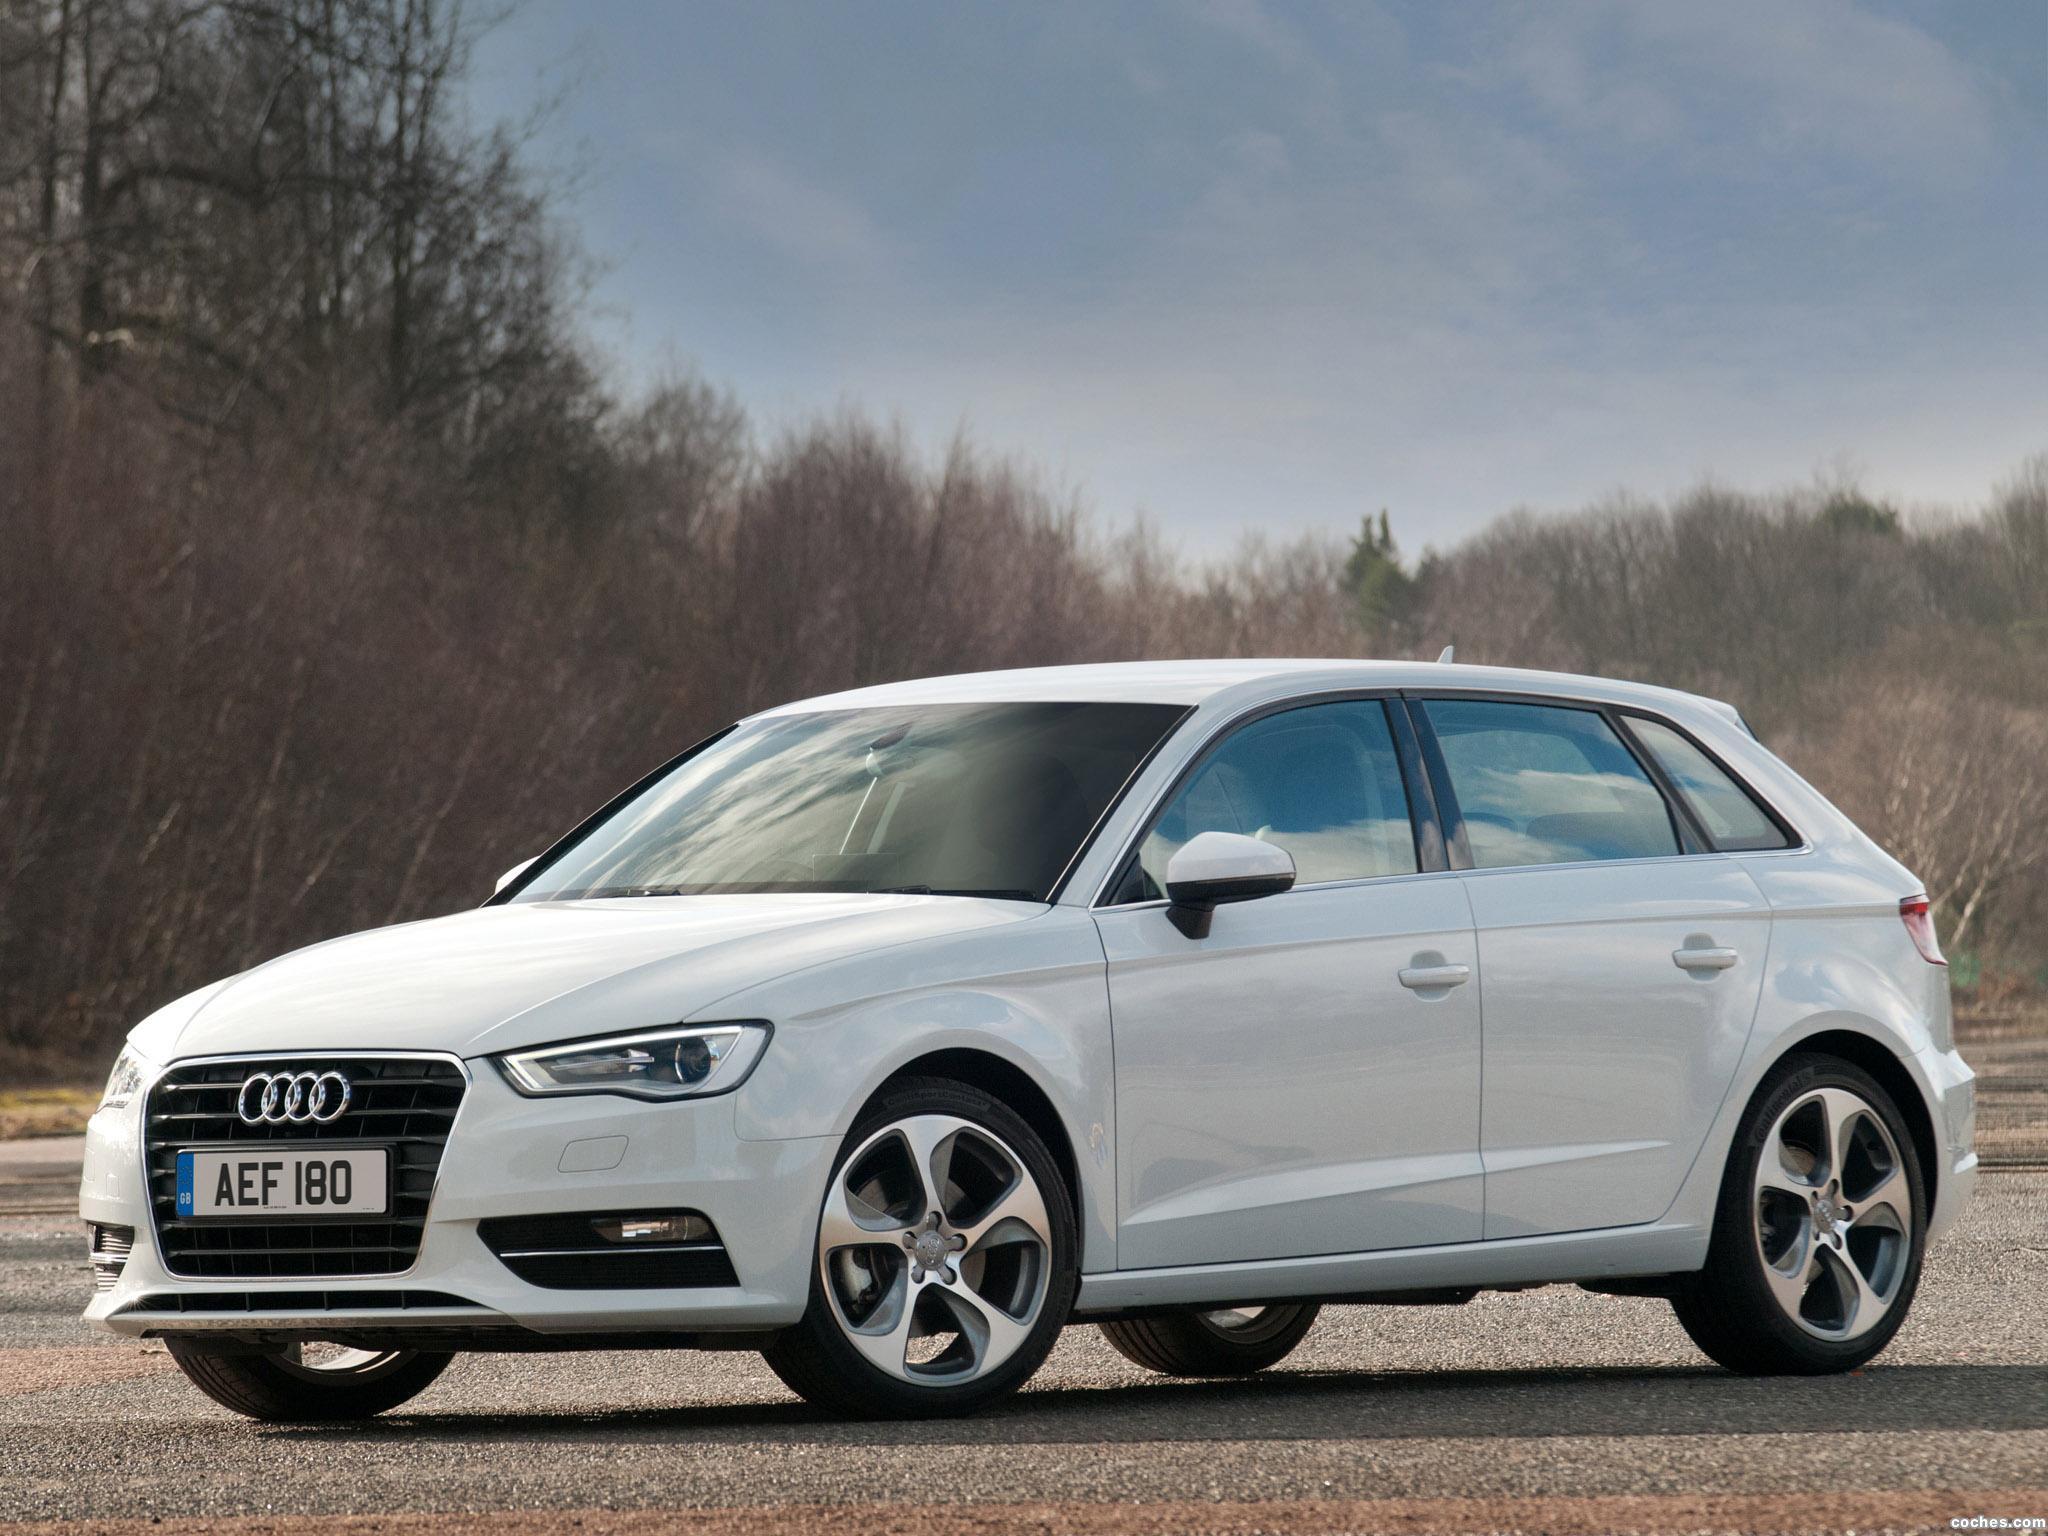 Foto 6 de Audi A3 Sportback 1.8T UK 2013